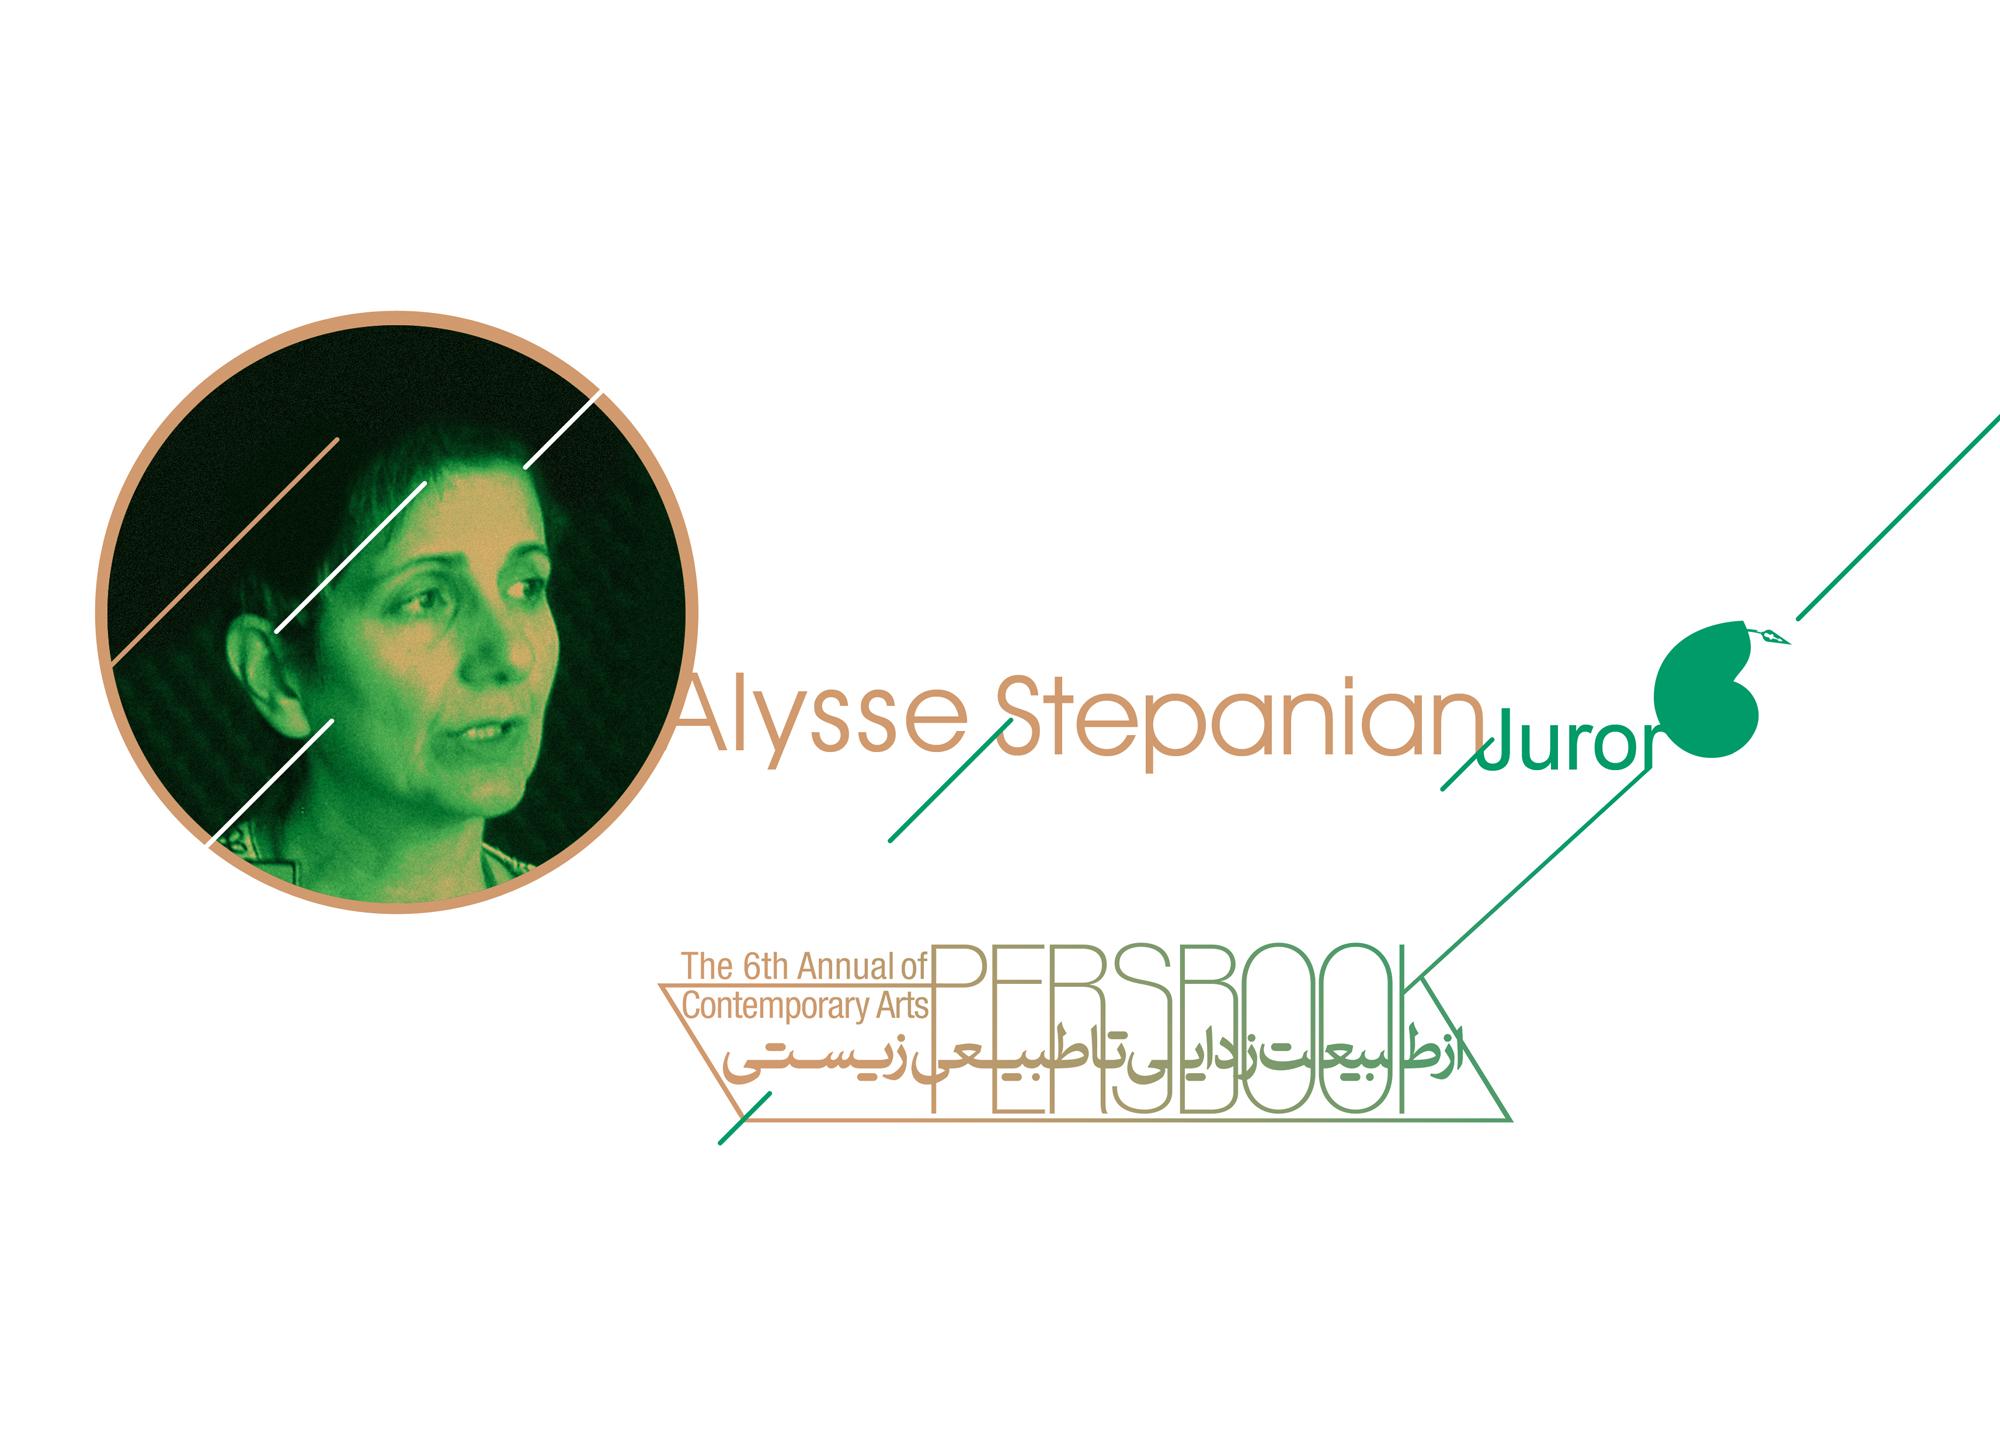 AlysseStepanian_PersbookArt2016juror